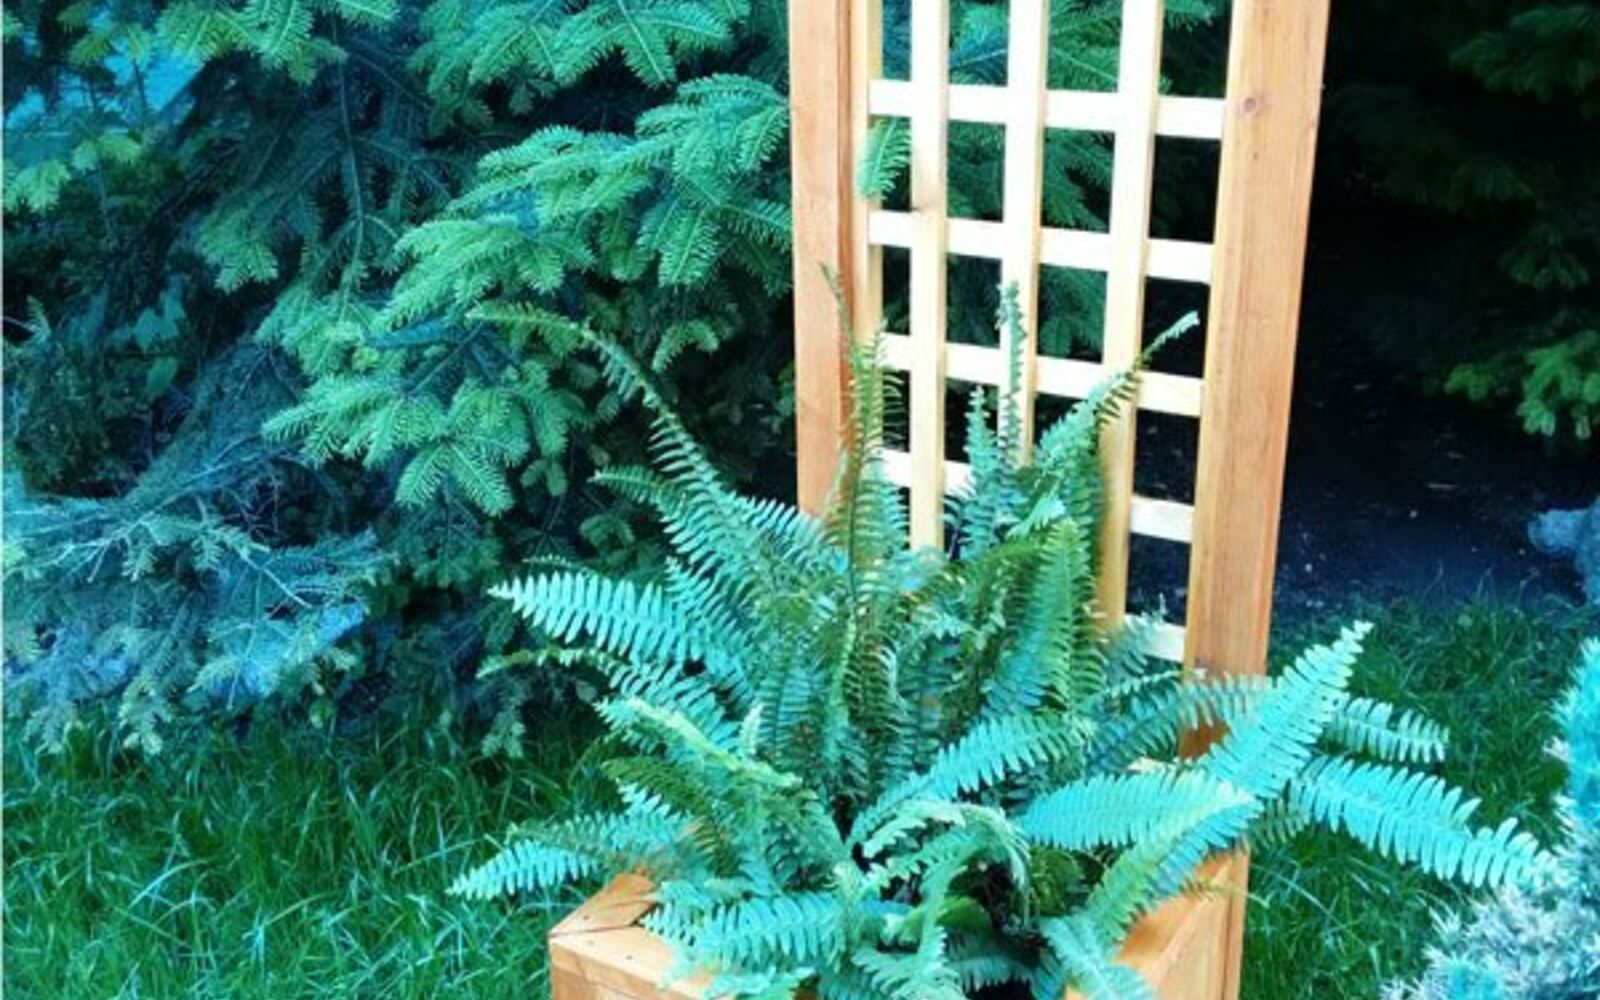 s 17 ways to build a gorgeous garden trellis this summer, gardening, Build a trellis planter for any corner